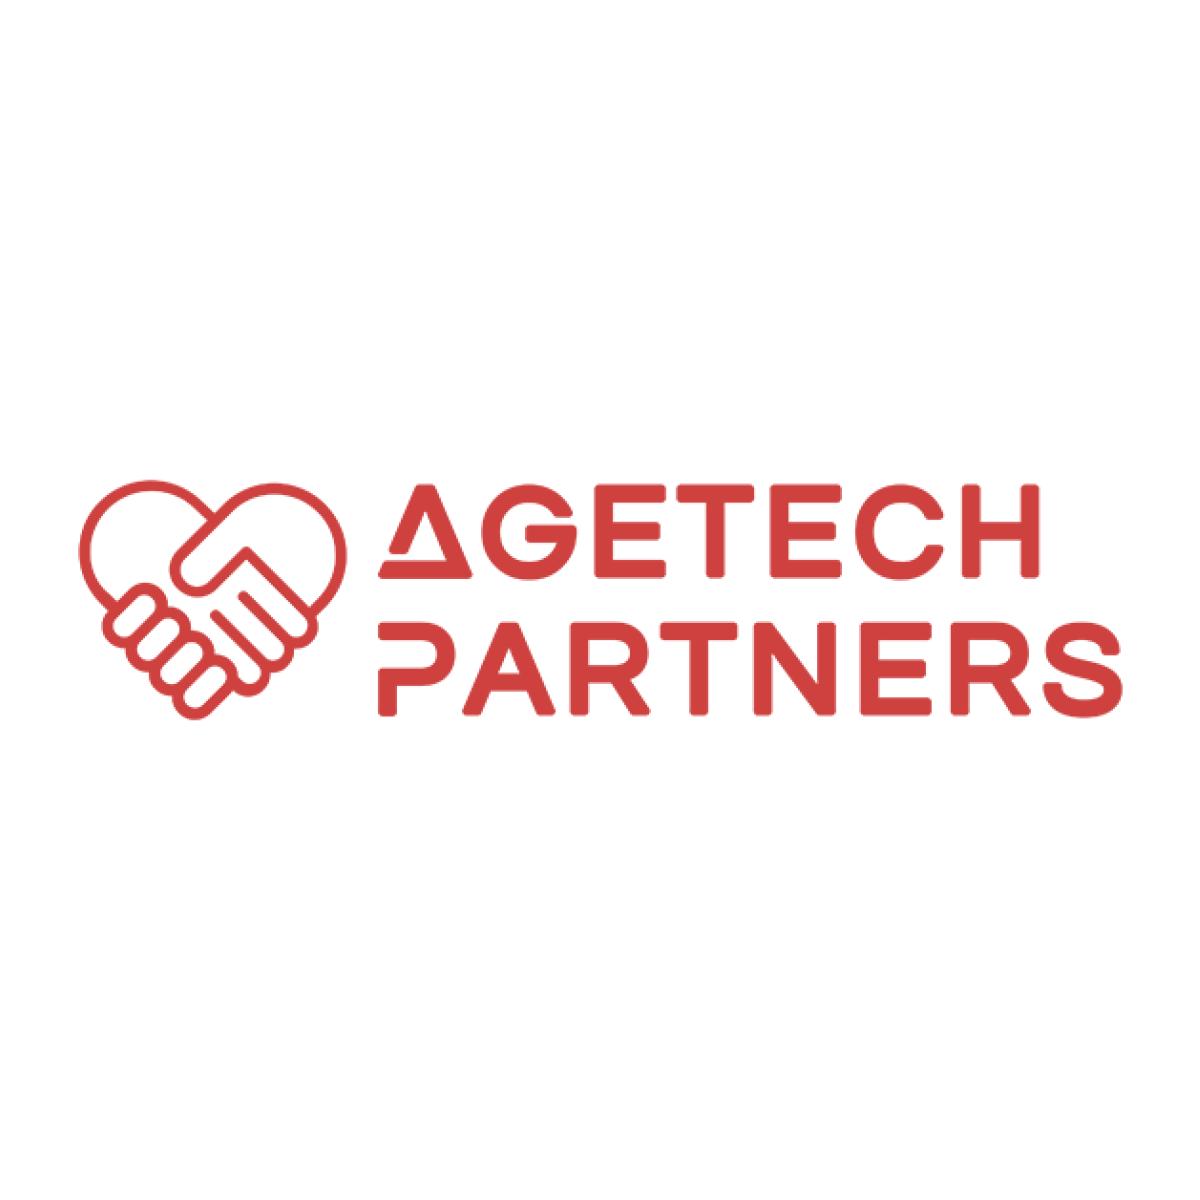 Agetech Partners - Canada